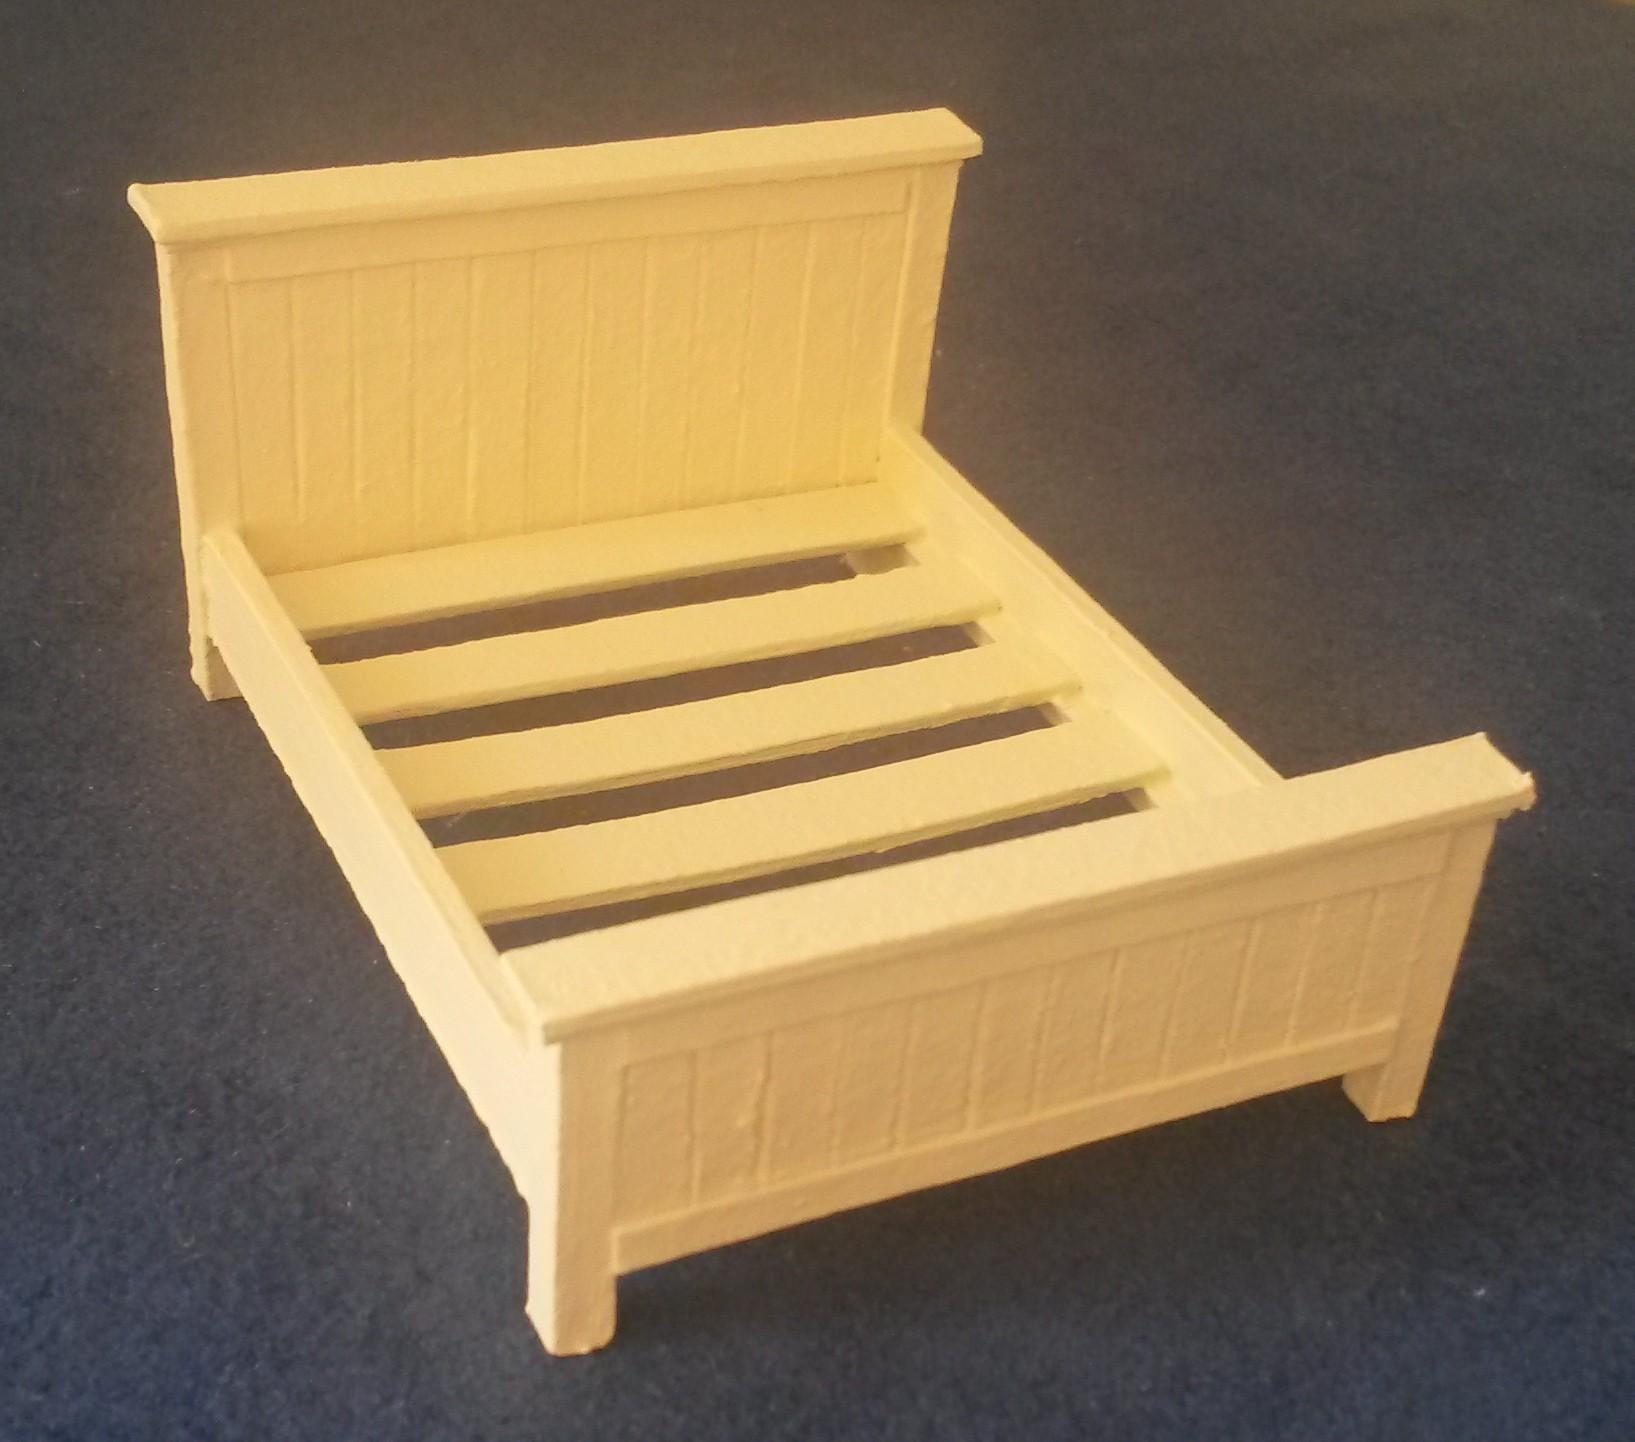 DHZ Pakket Bed, 2 persoons Landelijk 1:24 - Make it mini